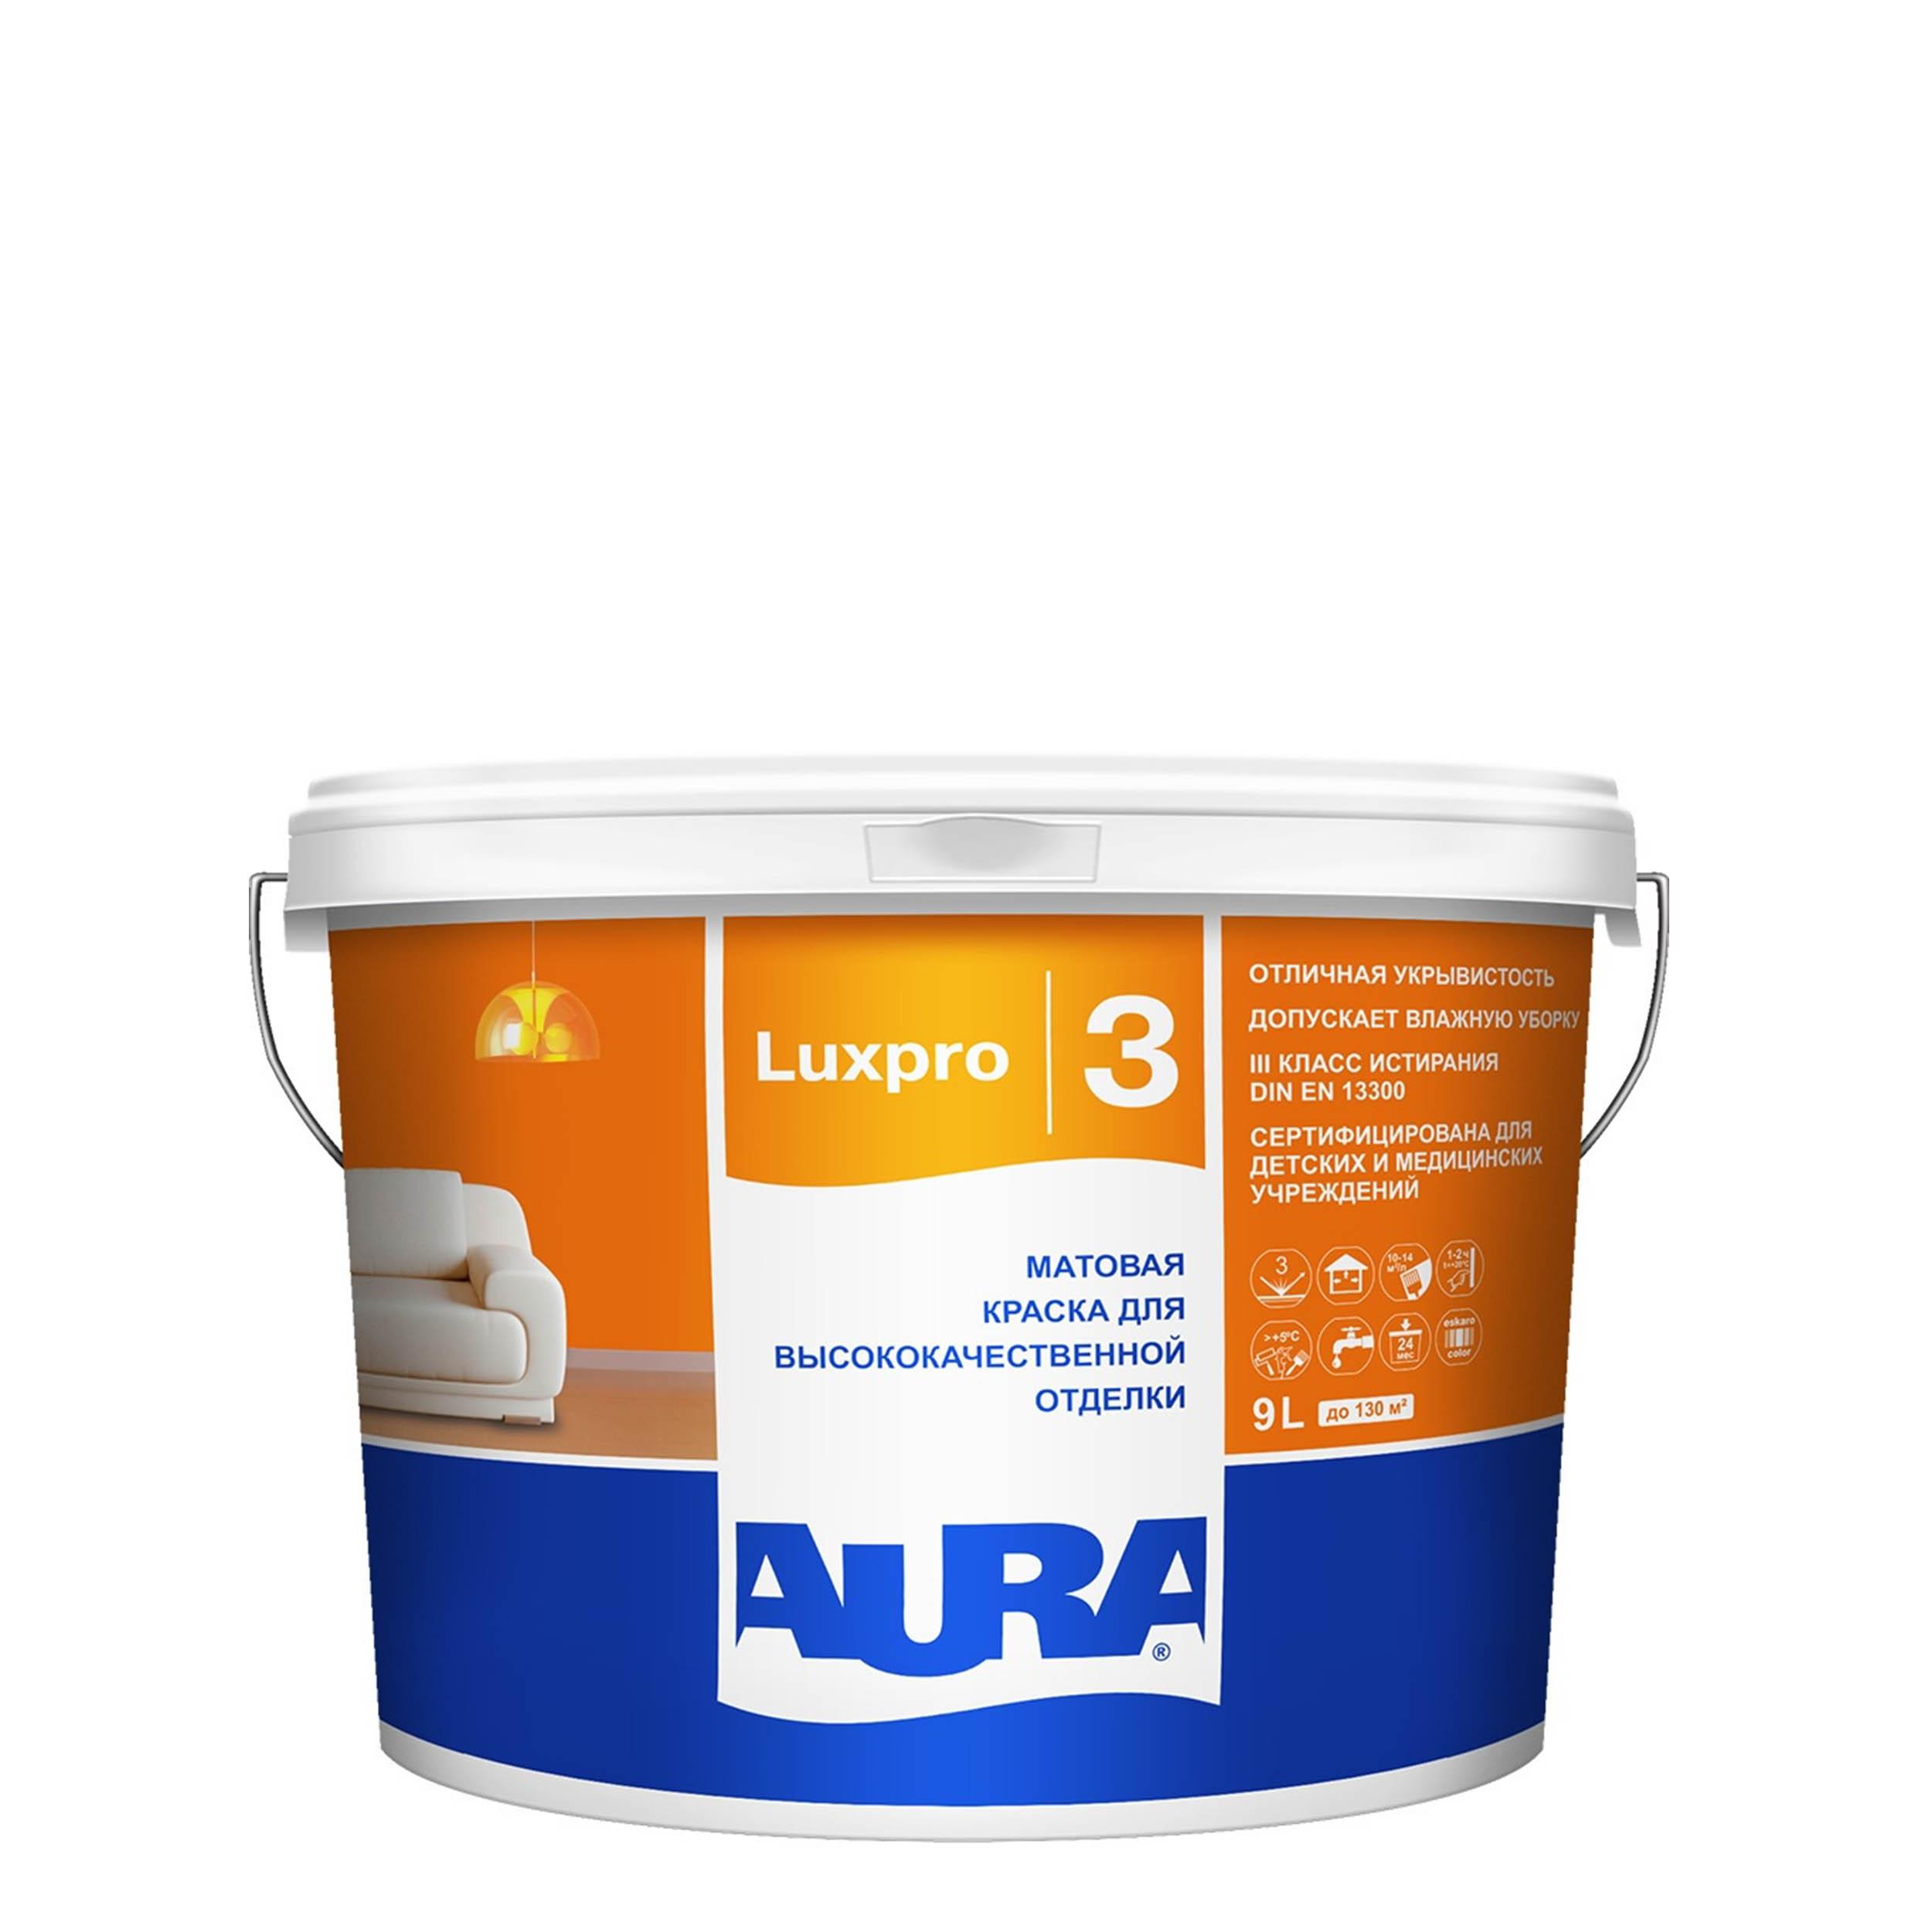 Фото 4 - Краска интерьерная, Aura LuxPRO 3, RAL 2001, 11 кг.